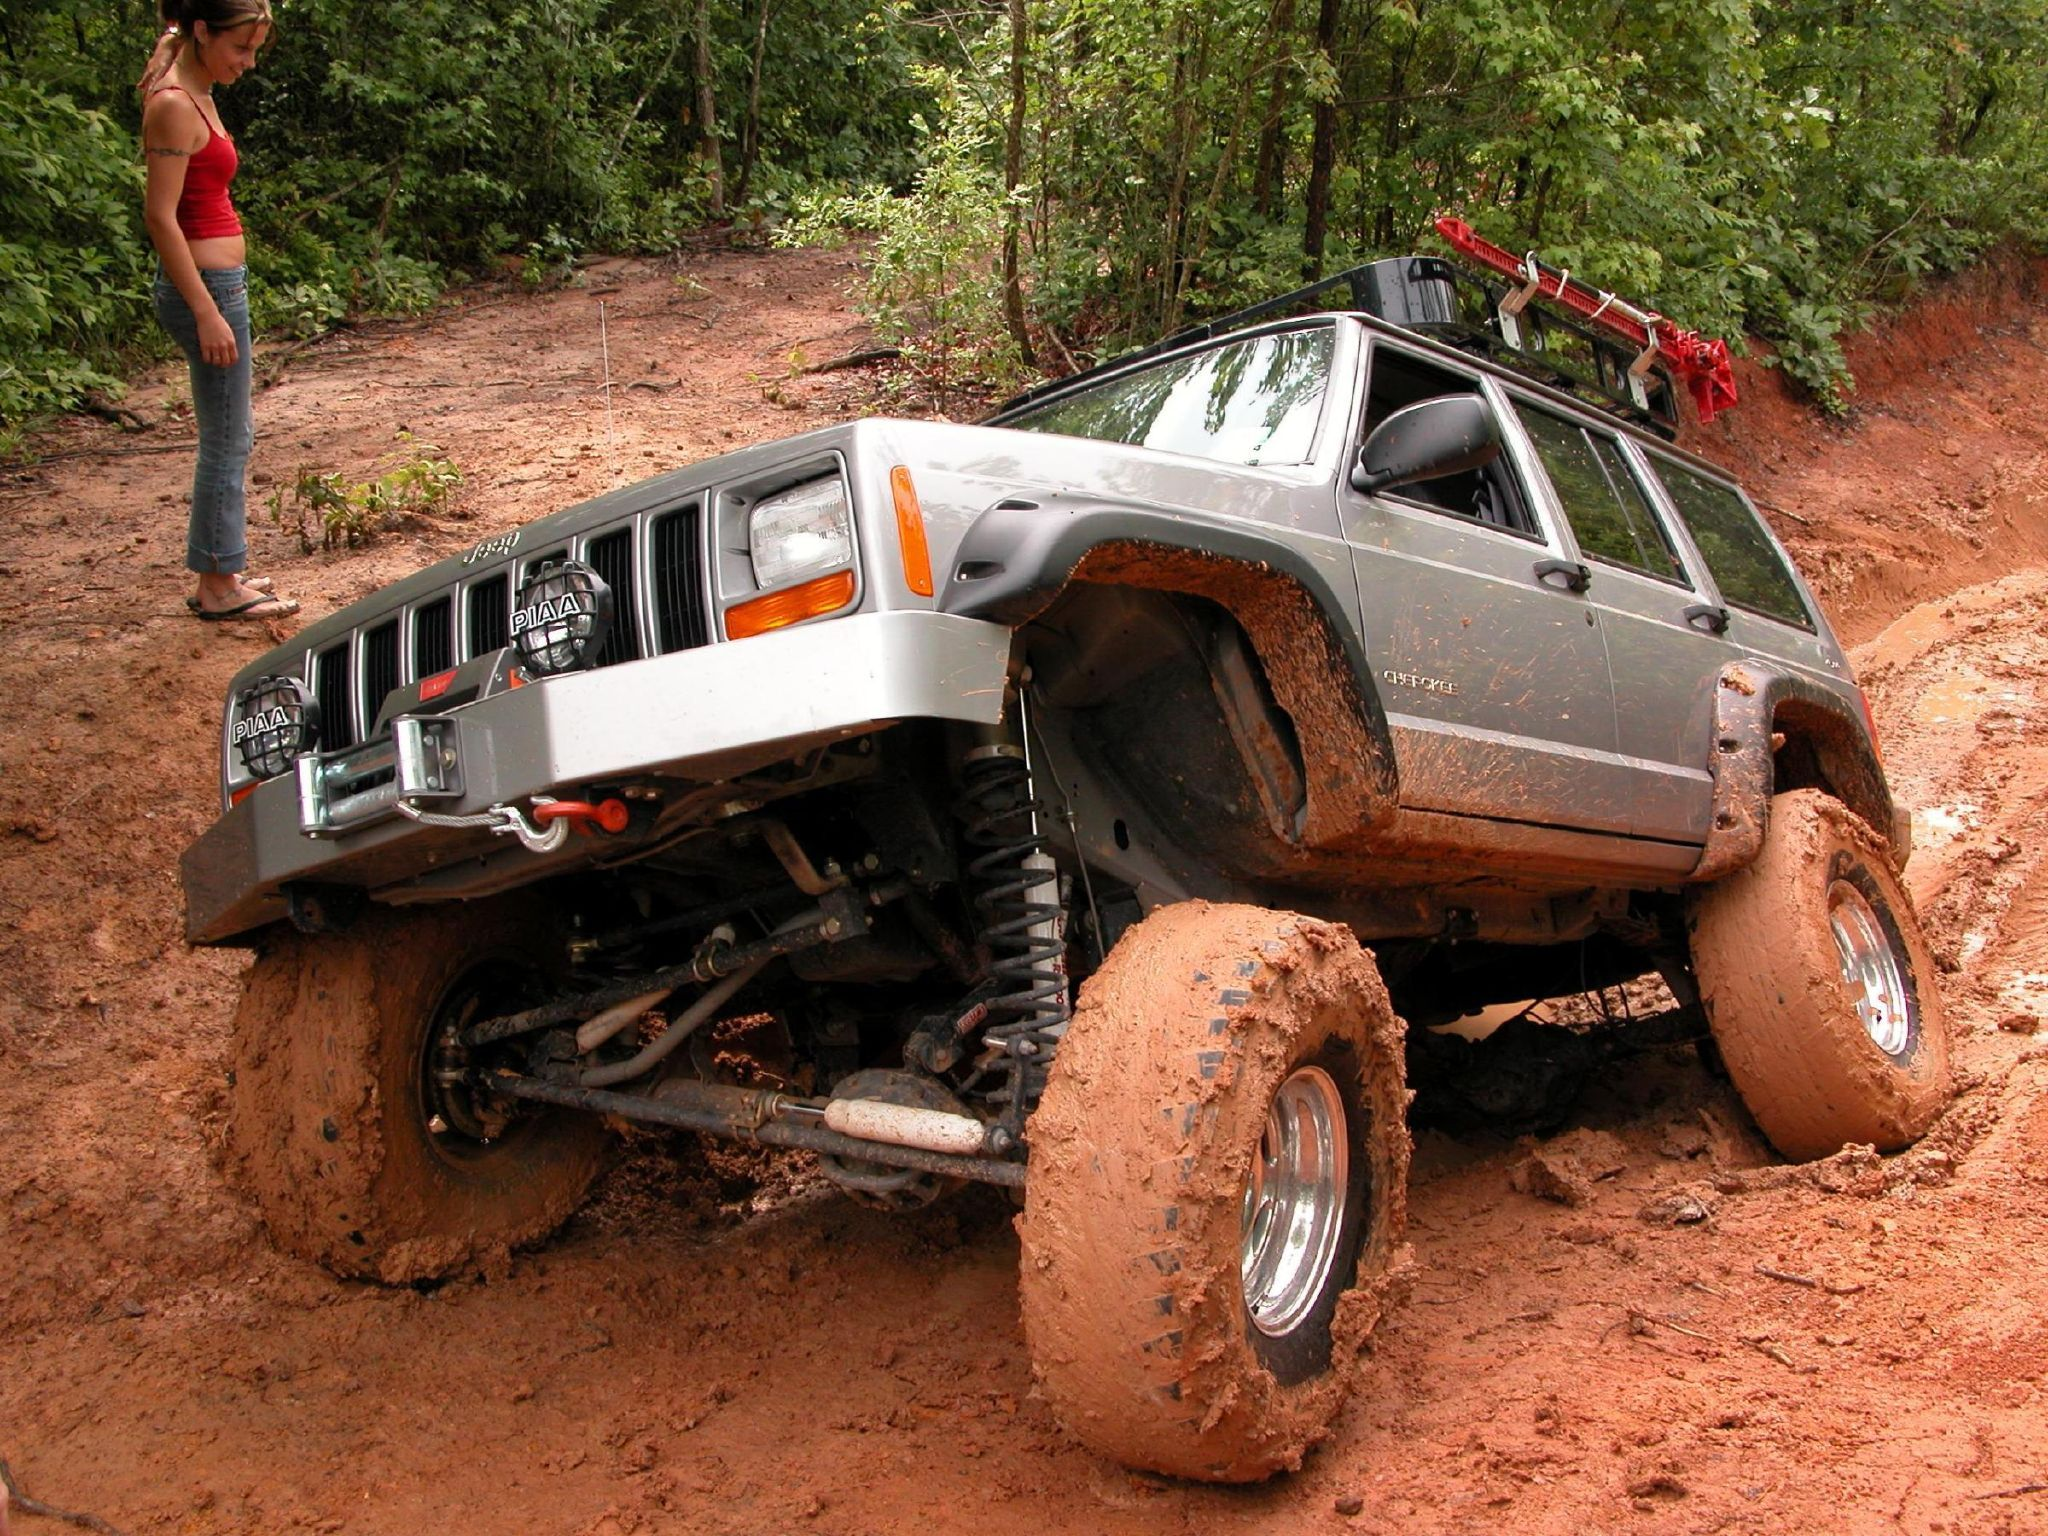 Jeep Cherokee Off Road Jeep Xj Jeep Cherokee Xj Jeep Cherokee